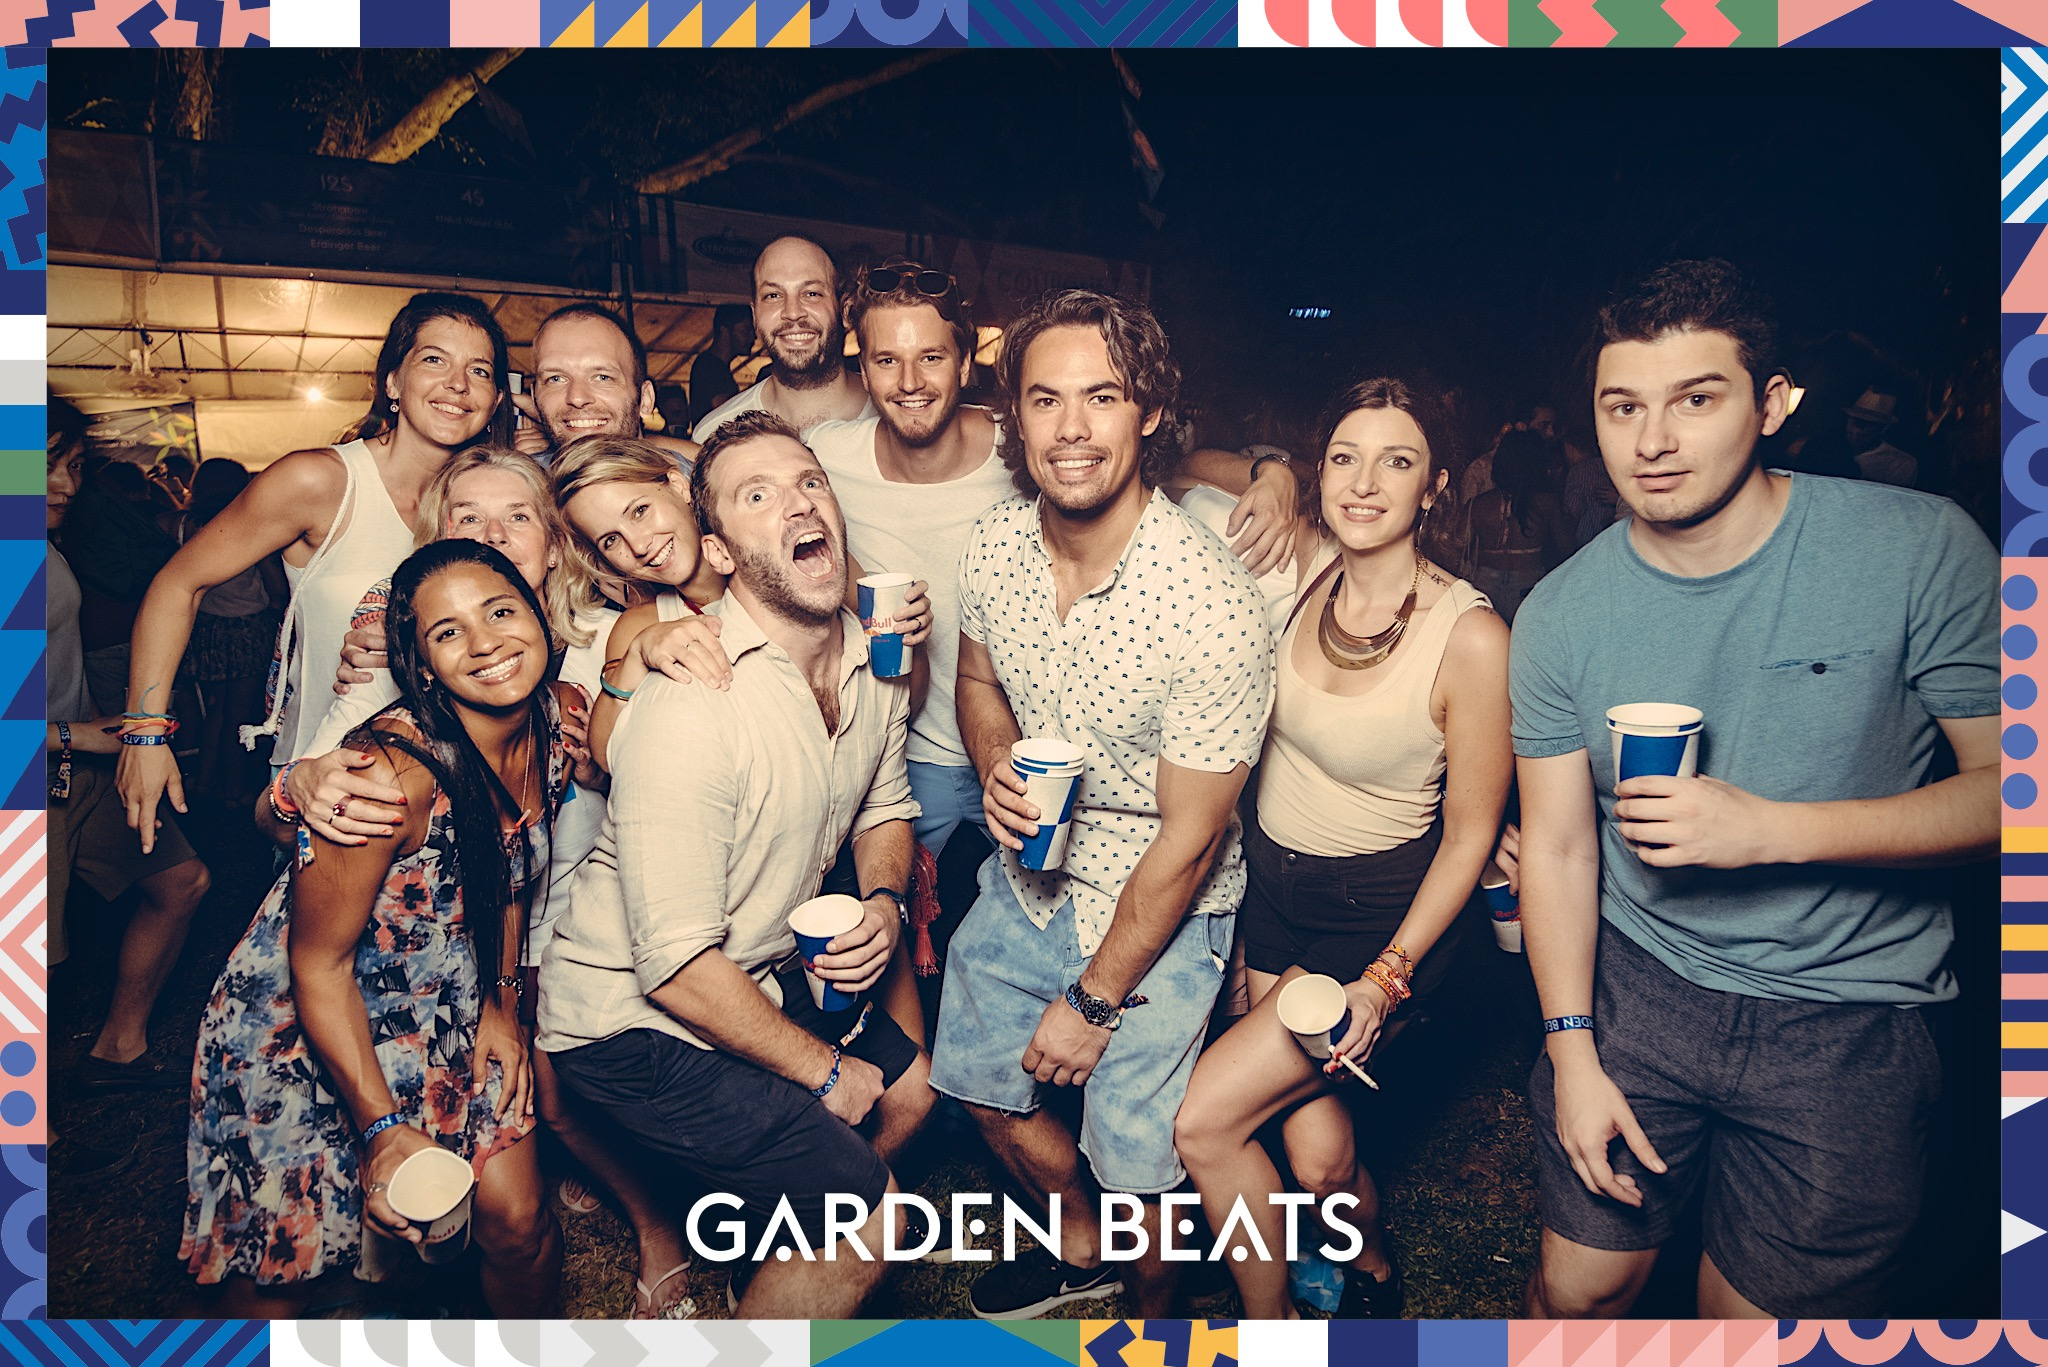 18032017_GardenBeats_Colossal748_WatermarkedGB.jpg